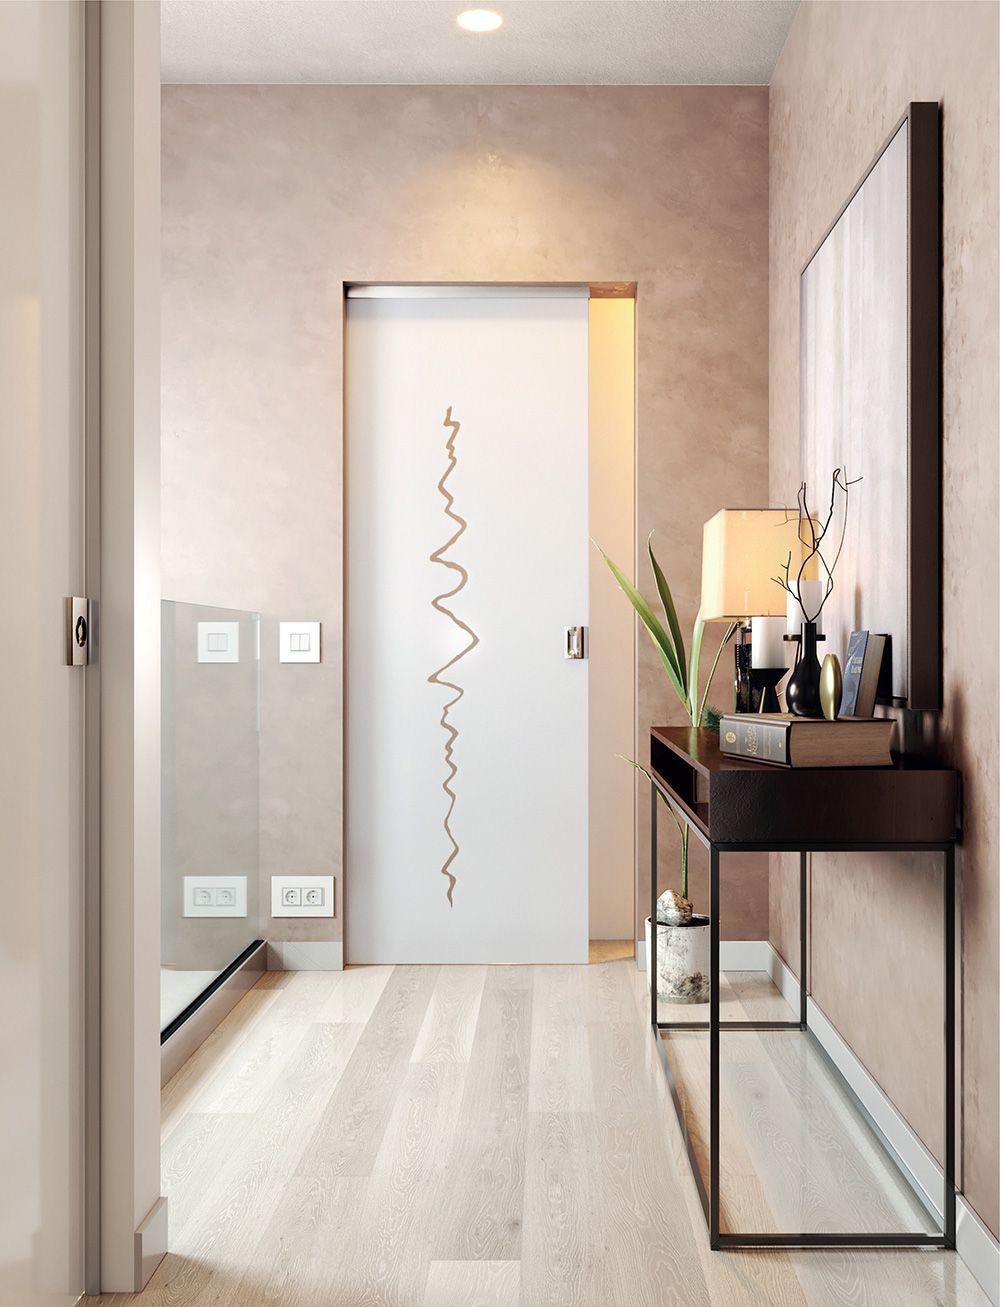 frameless glass pocket door - sandblasted design